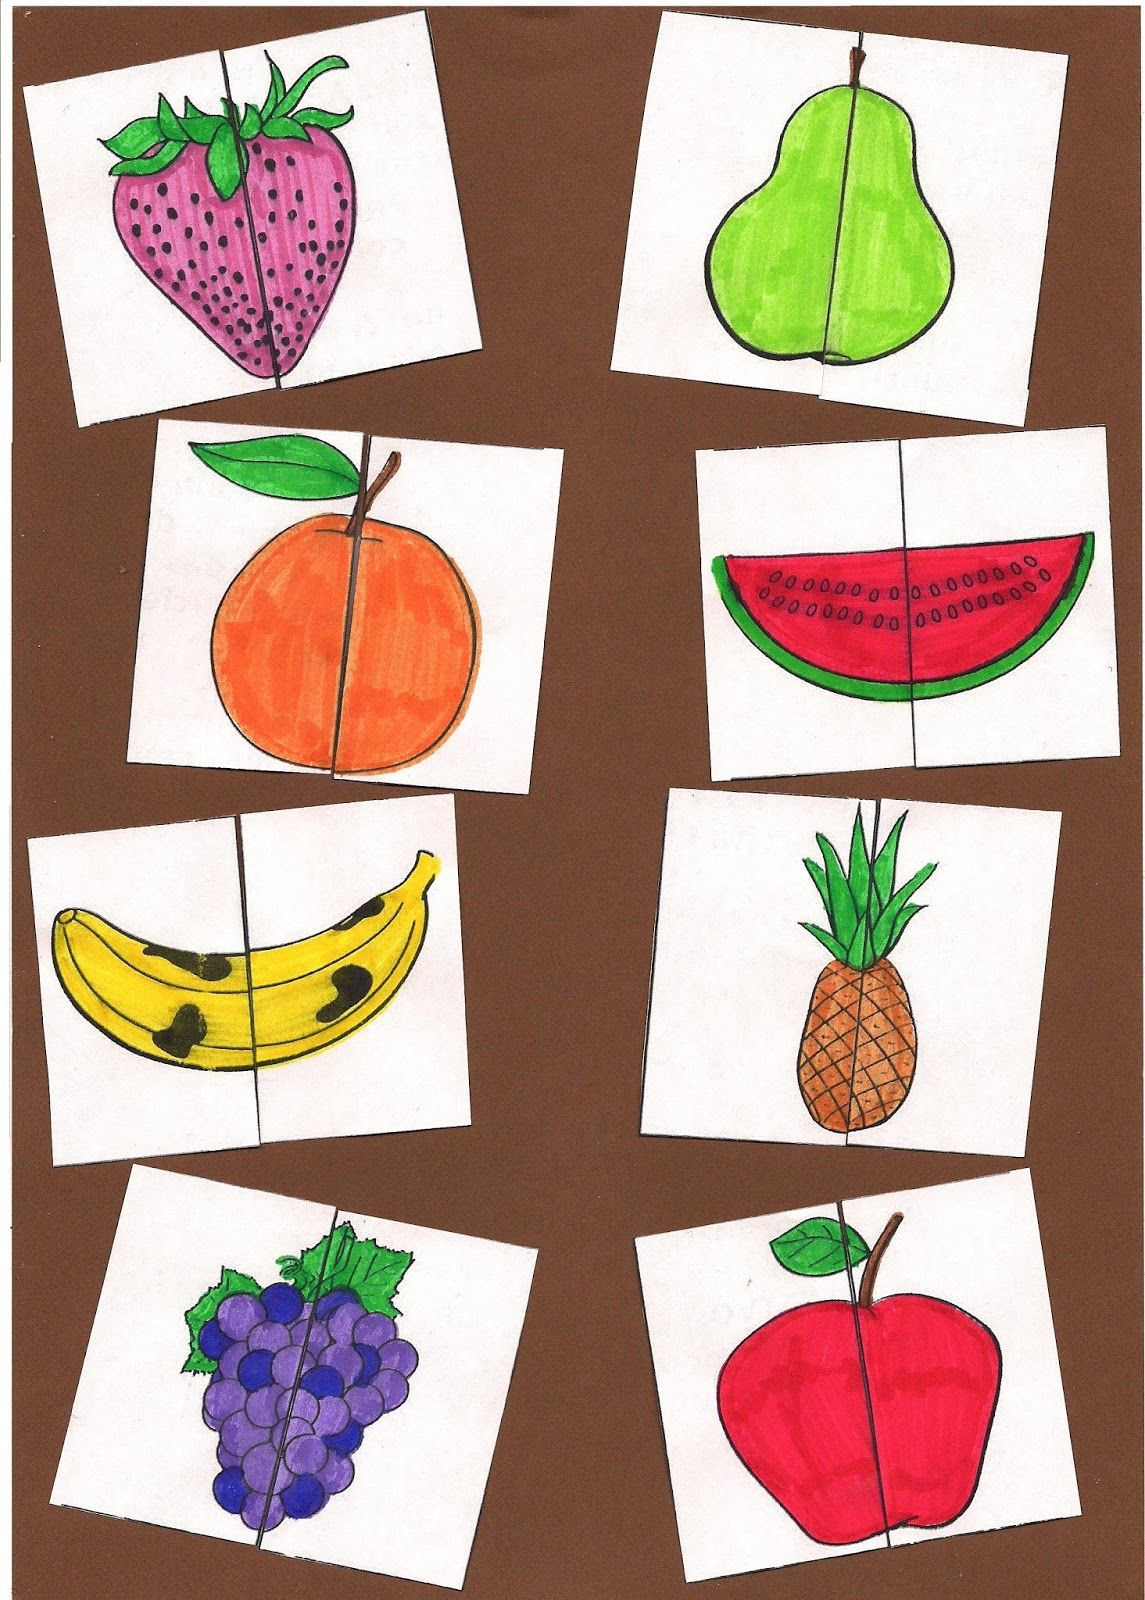 Menta m s chocolate recursos para educaci n infantil for Proyecto de comedor infantil